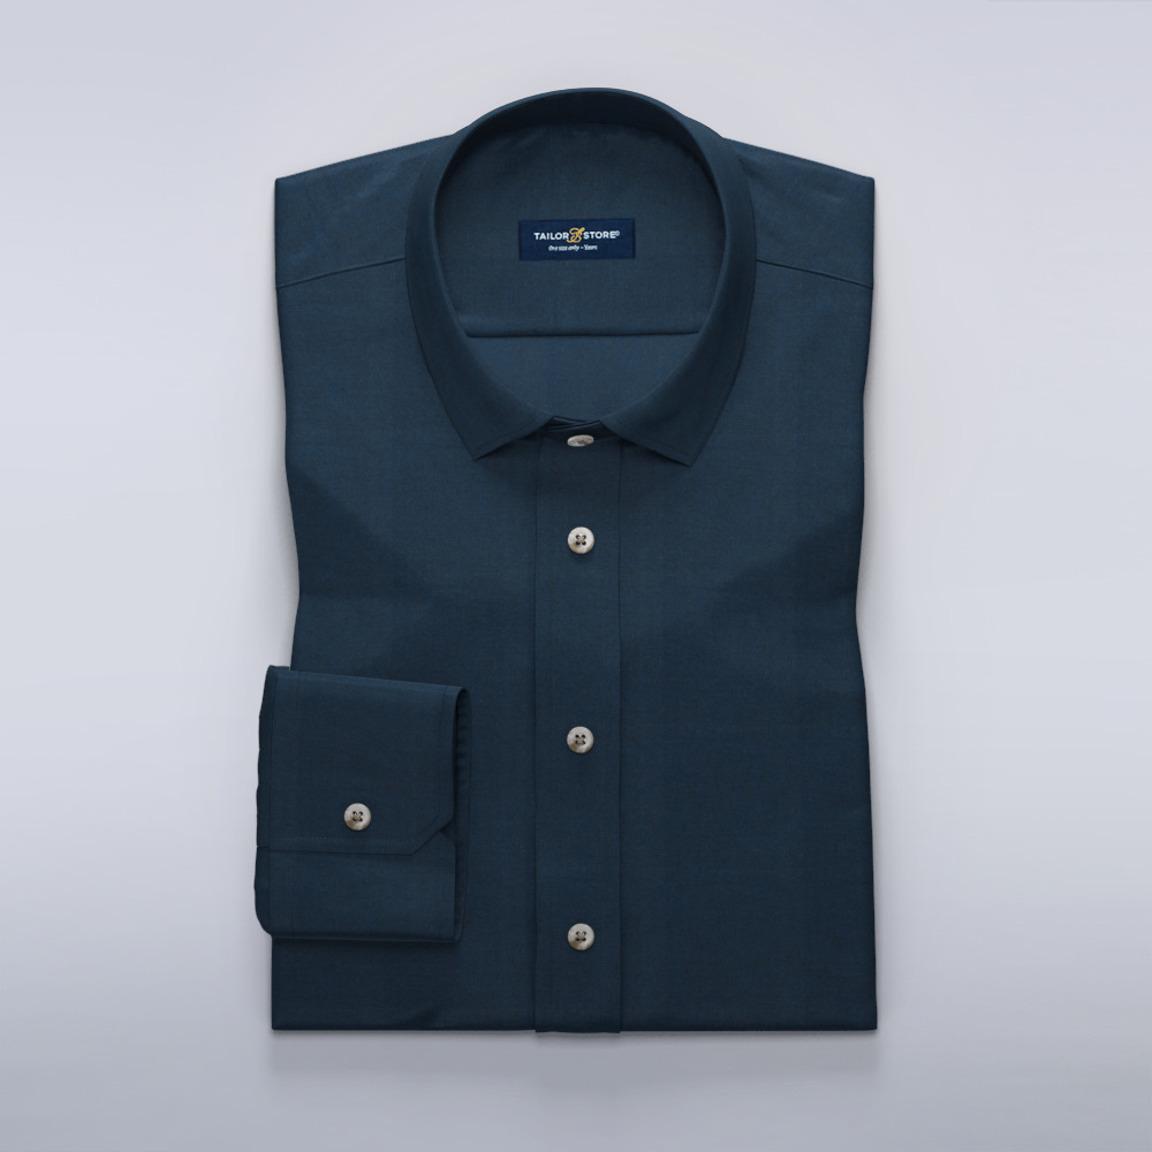 Marineblaues Hemd aus Baumwoll-Tencel-Twillstoff